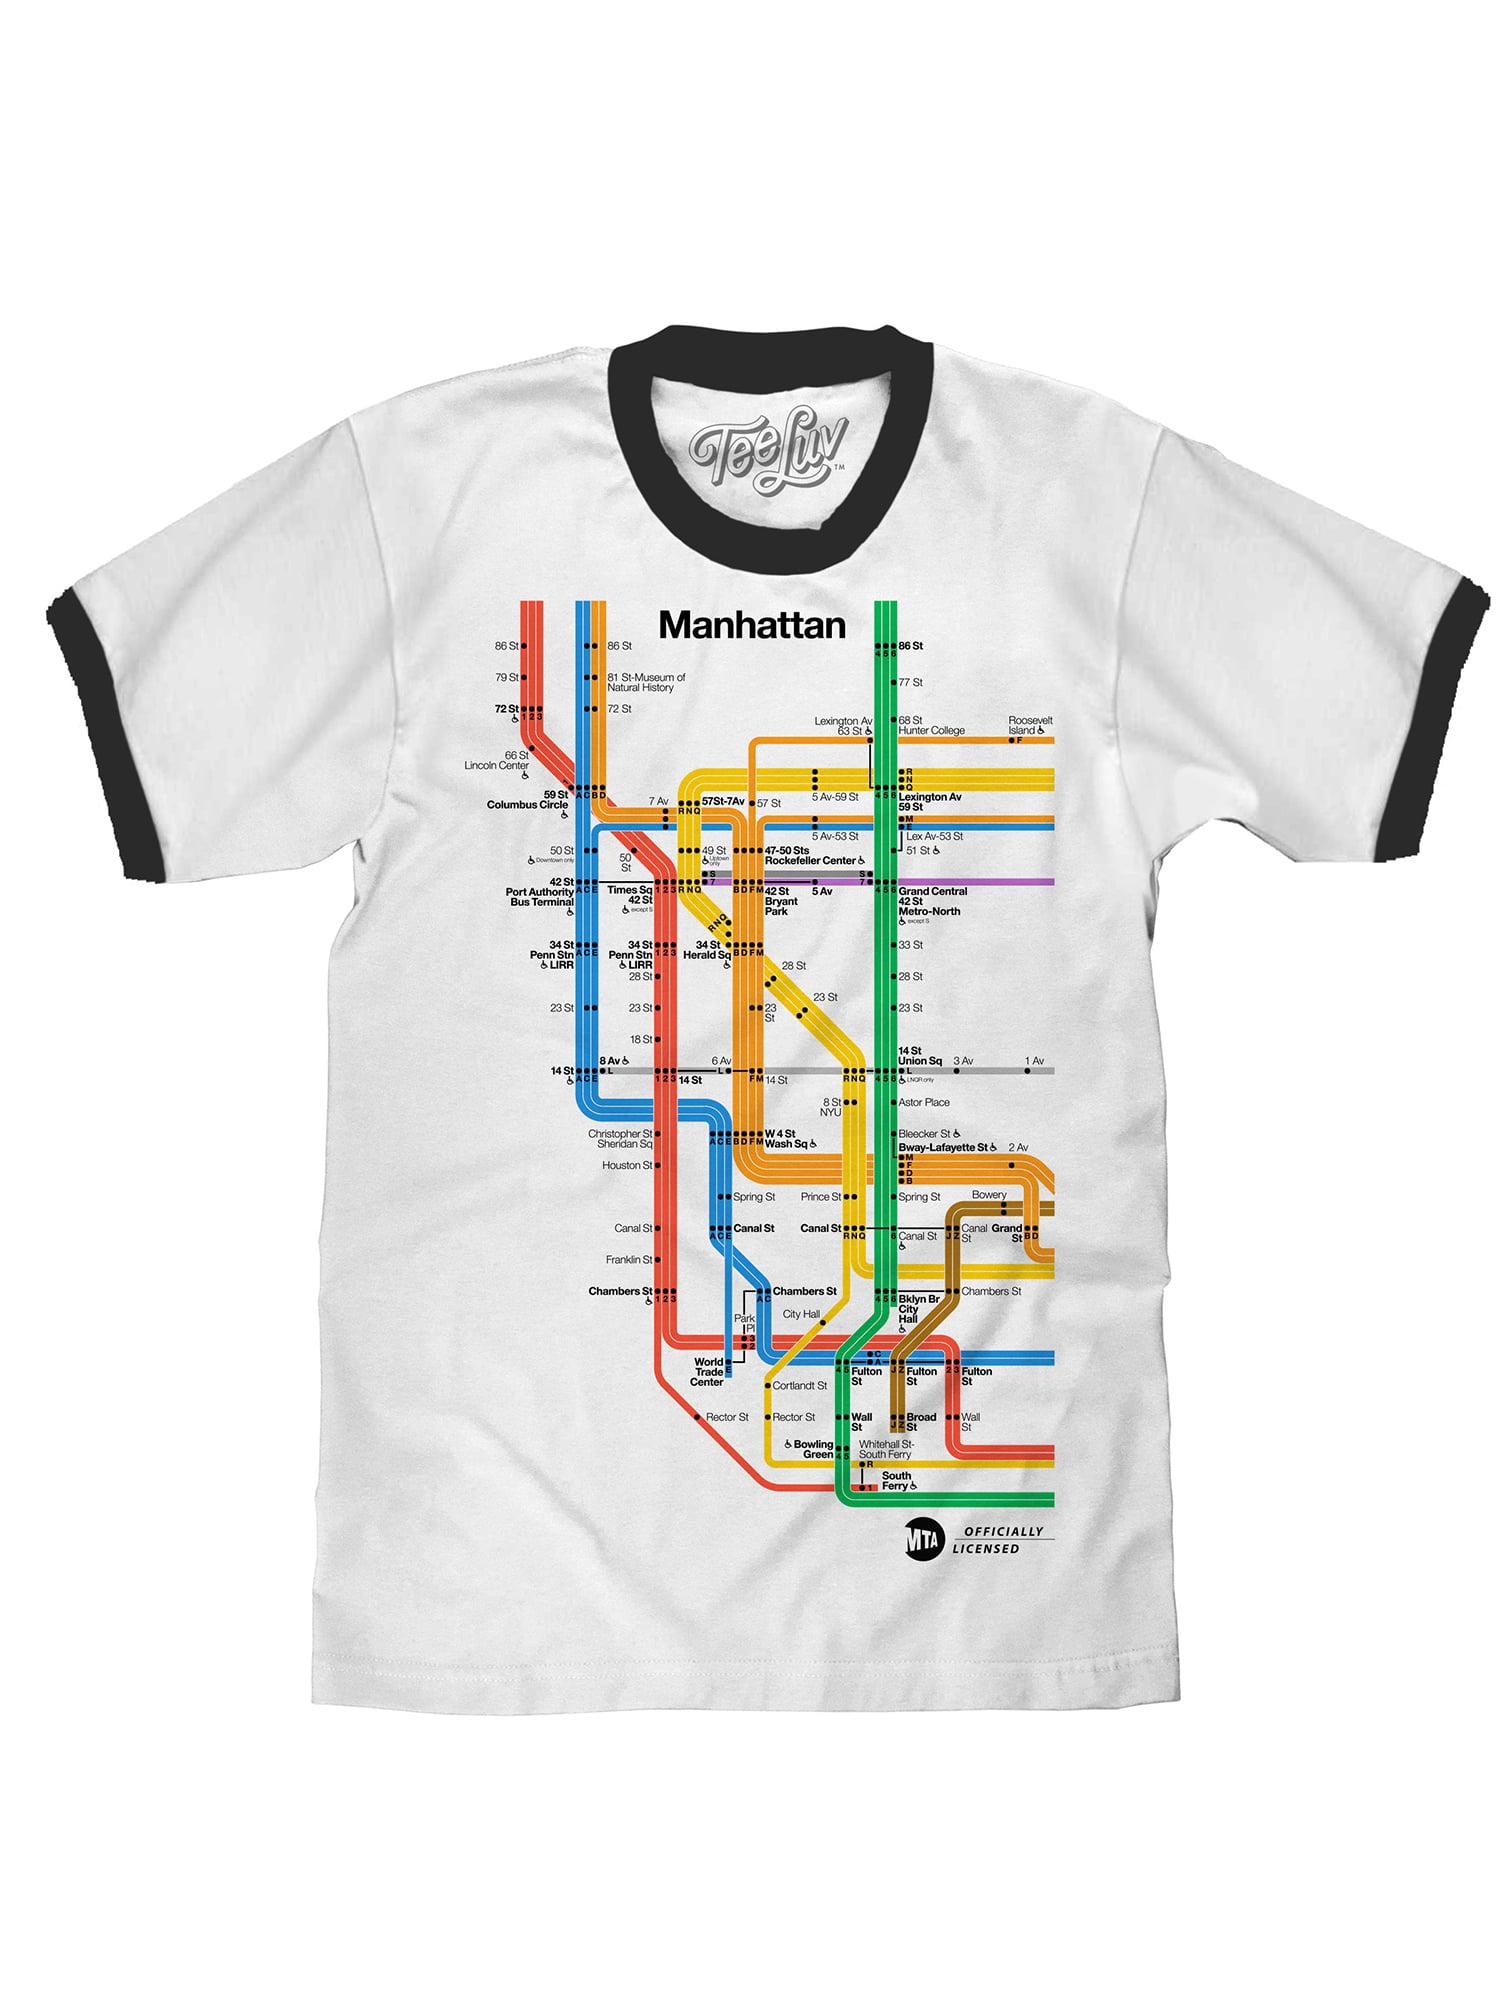 MTA New York City Subway Hoodie Big Apple Metro White Black Hooded Sweatshirt